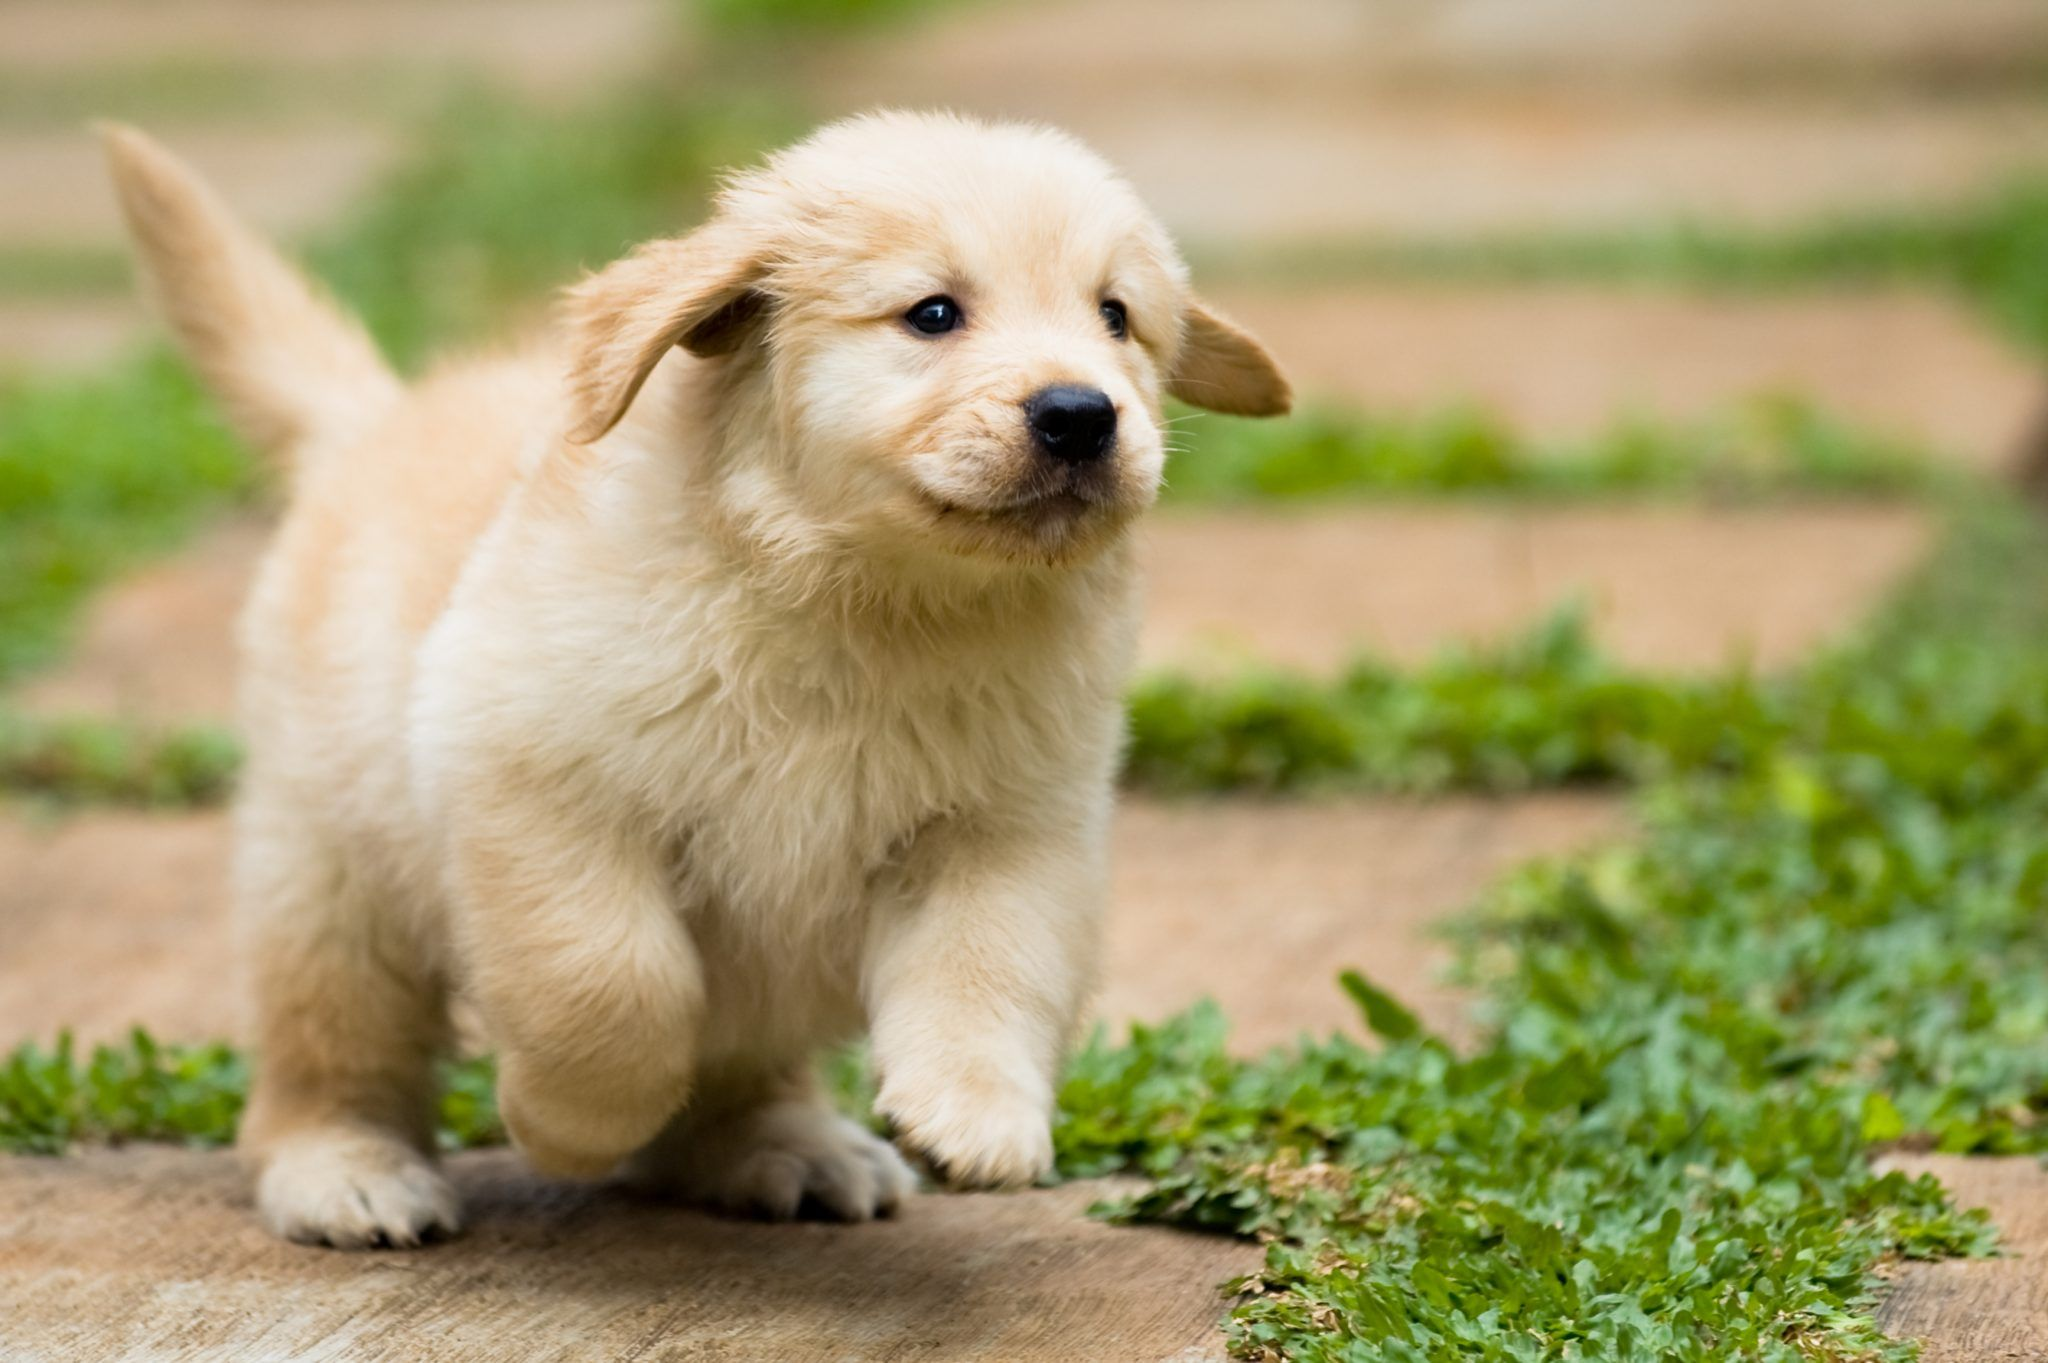 Wonderful Cubby Chubby Adorable Dog - 7aed6b8660e6cdd22a03638c64da679a  You Should Have_66981  .jpg